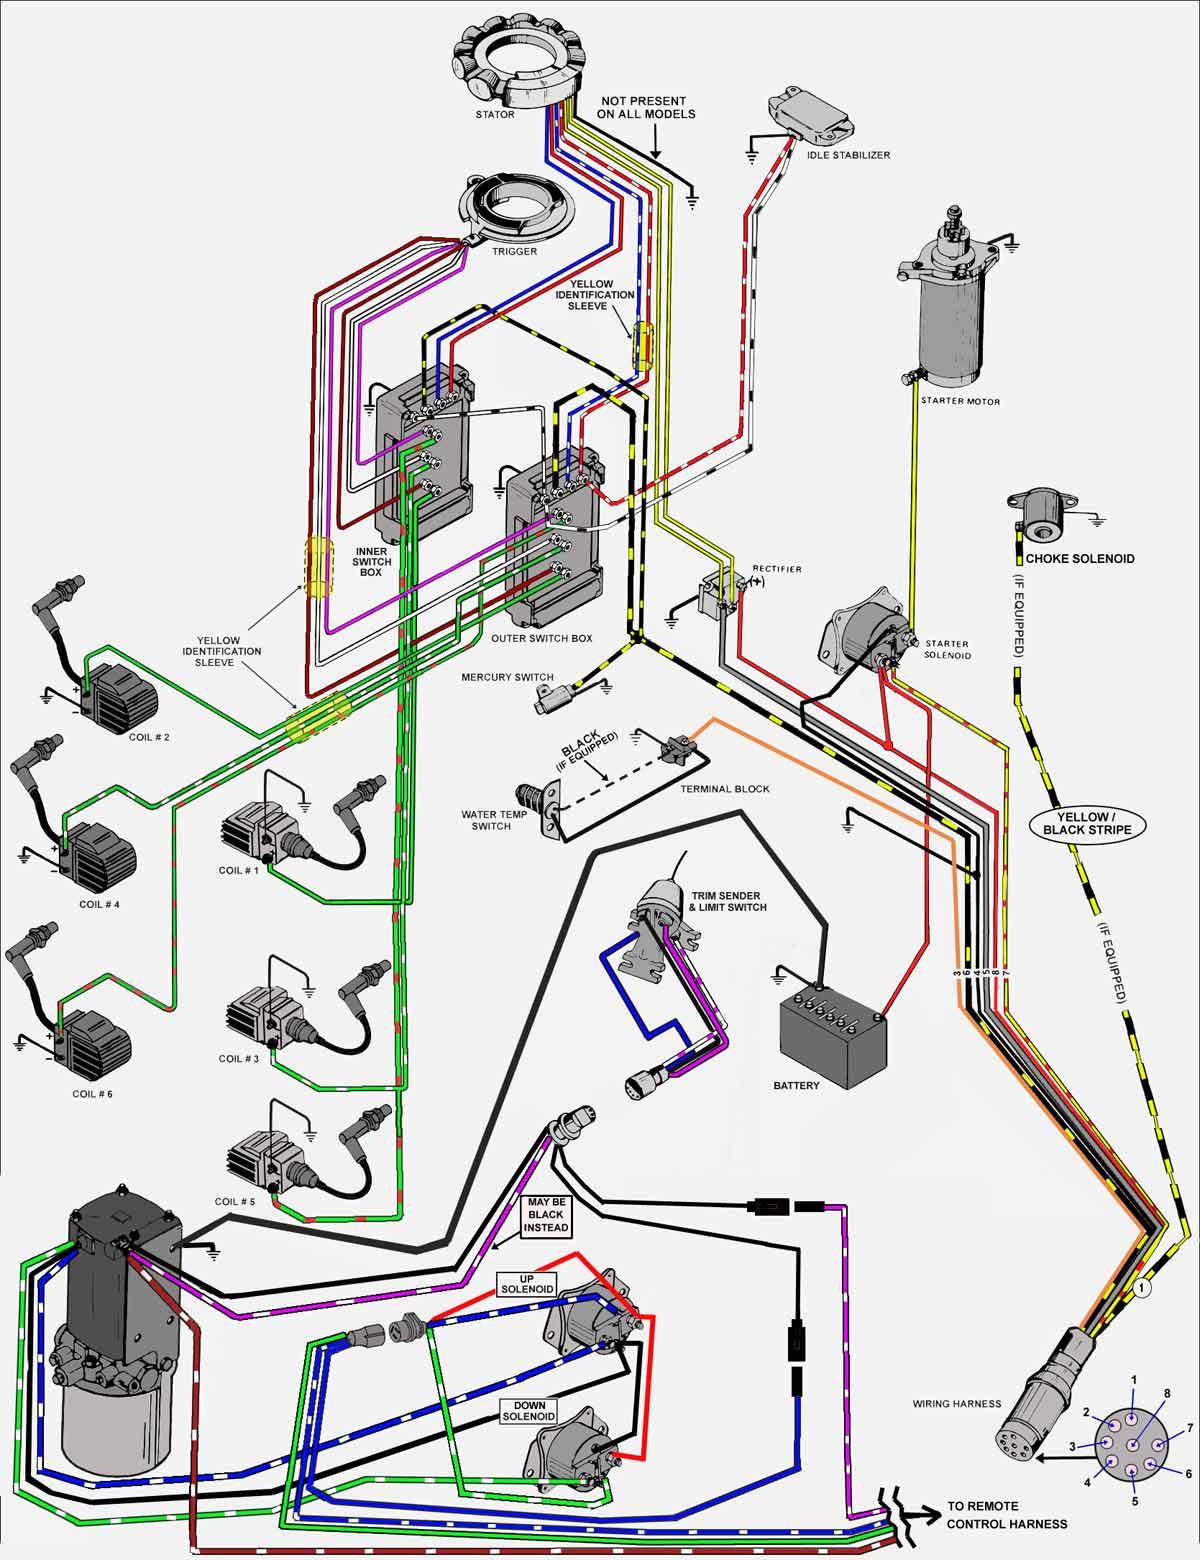 limit switch wiring diagram car towing socket mercury 200 boat motor manual 2019 ebook library merc